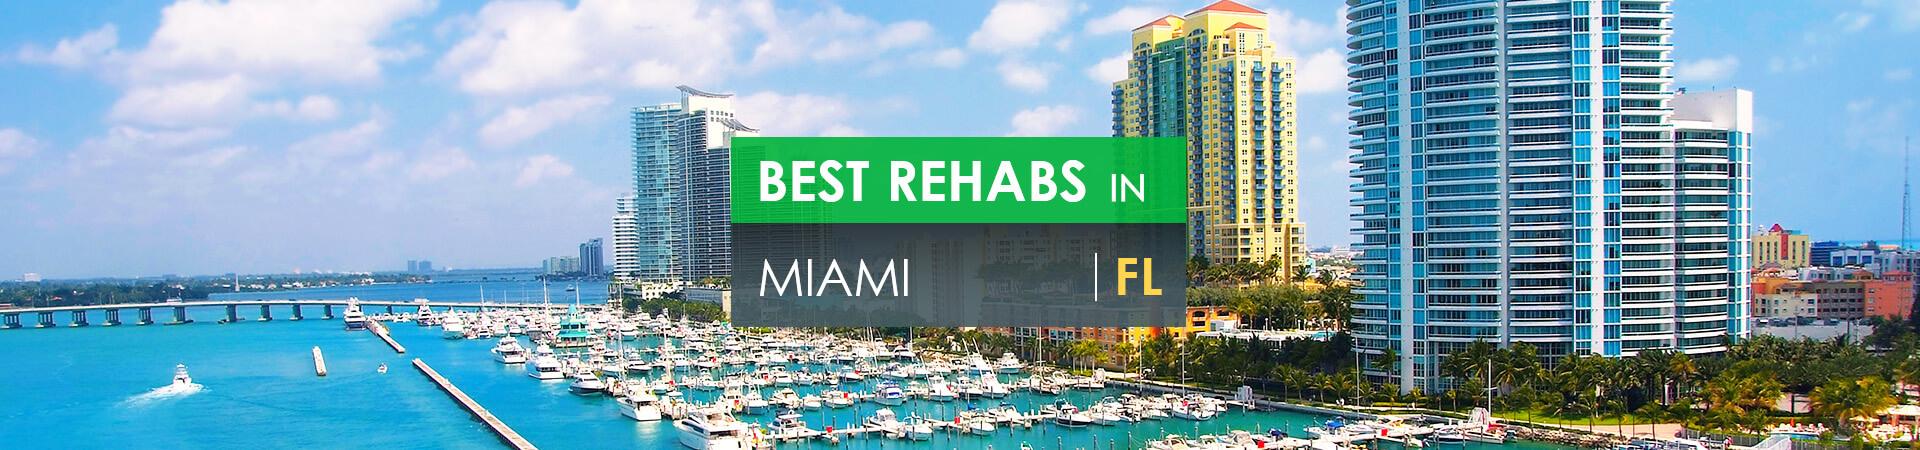 Best rehabs in Miami, FL